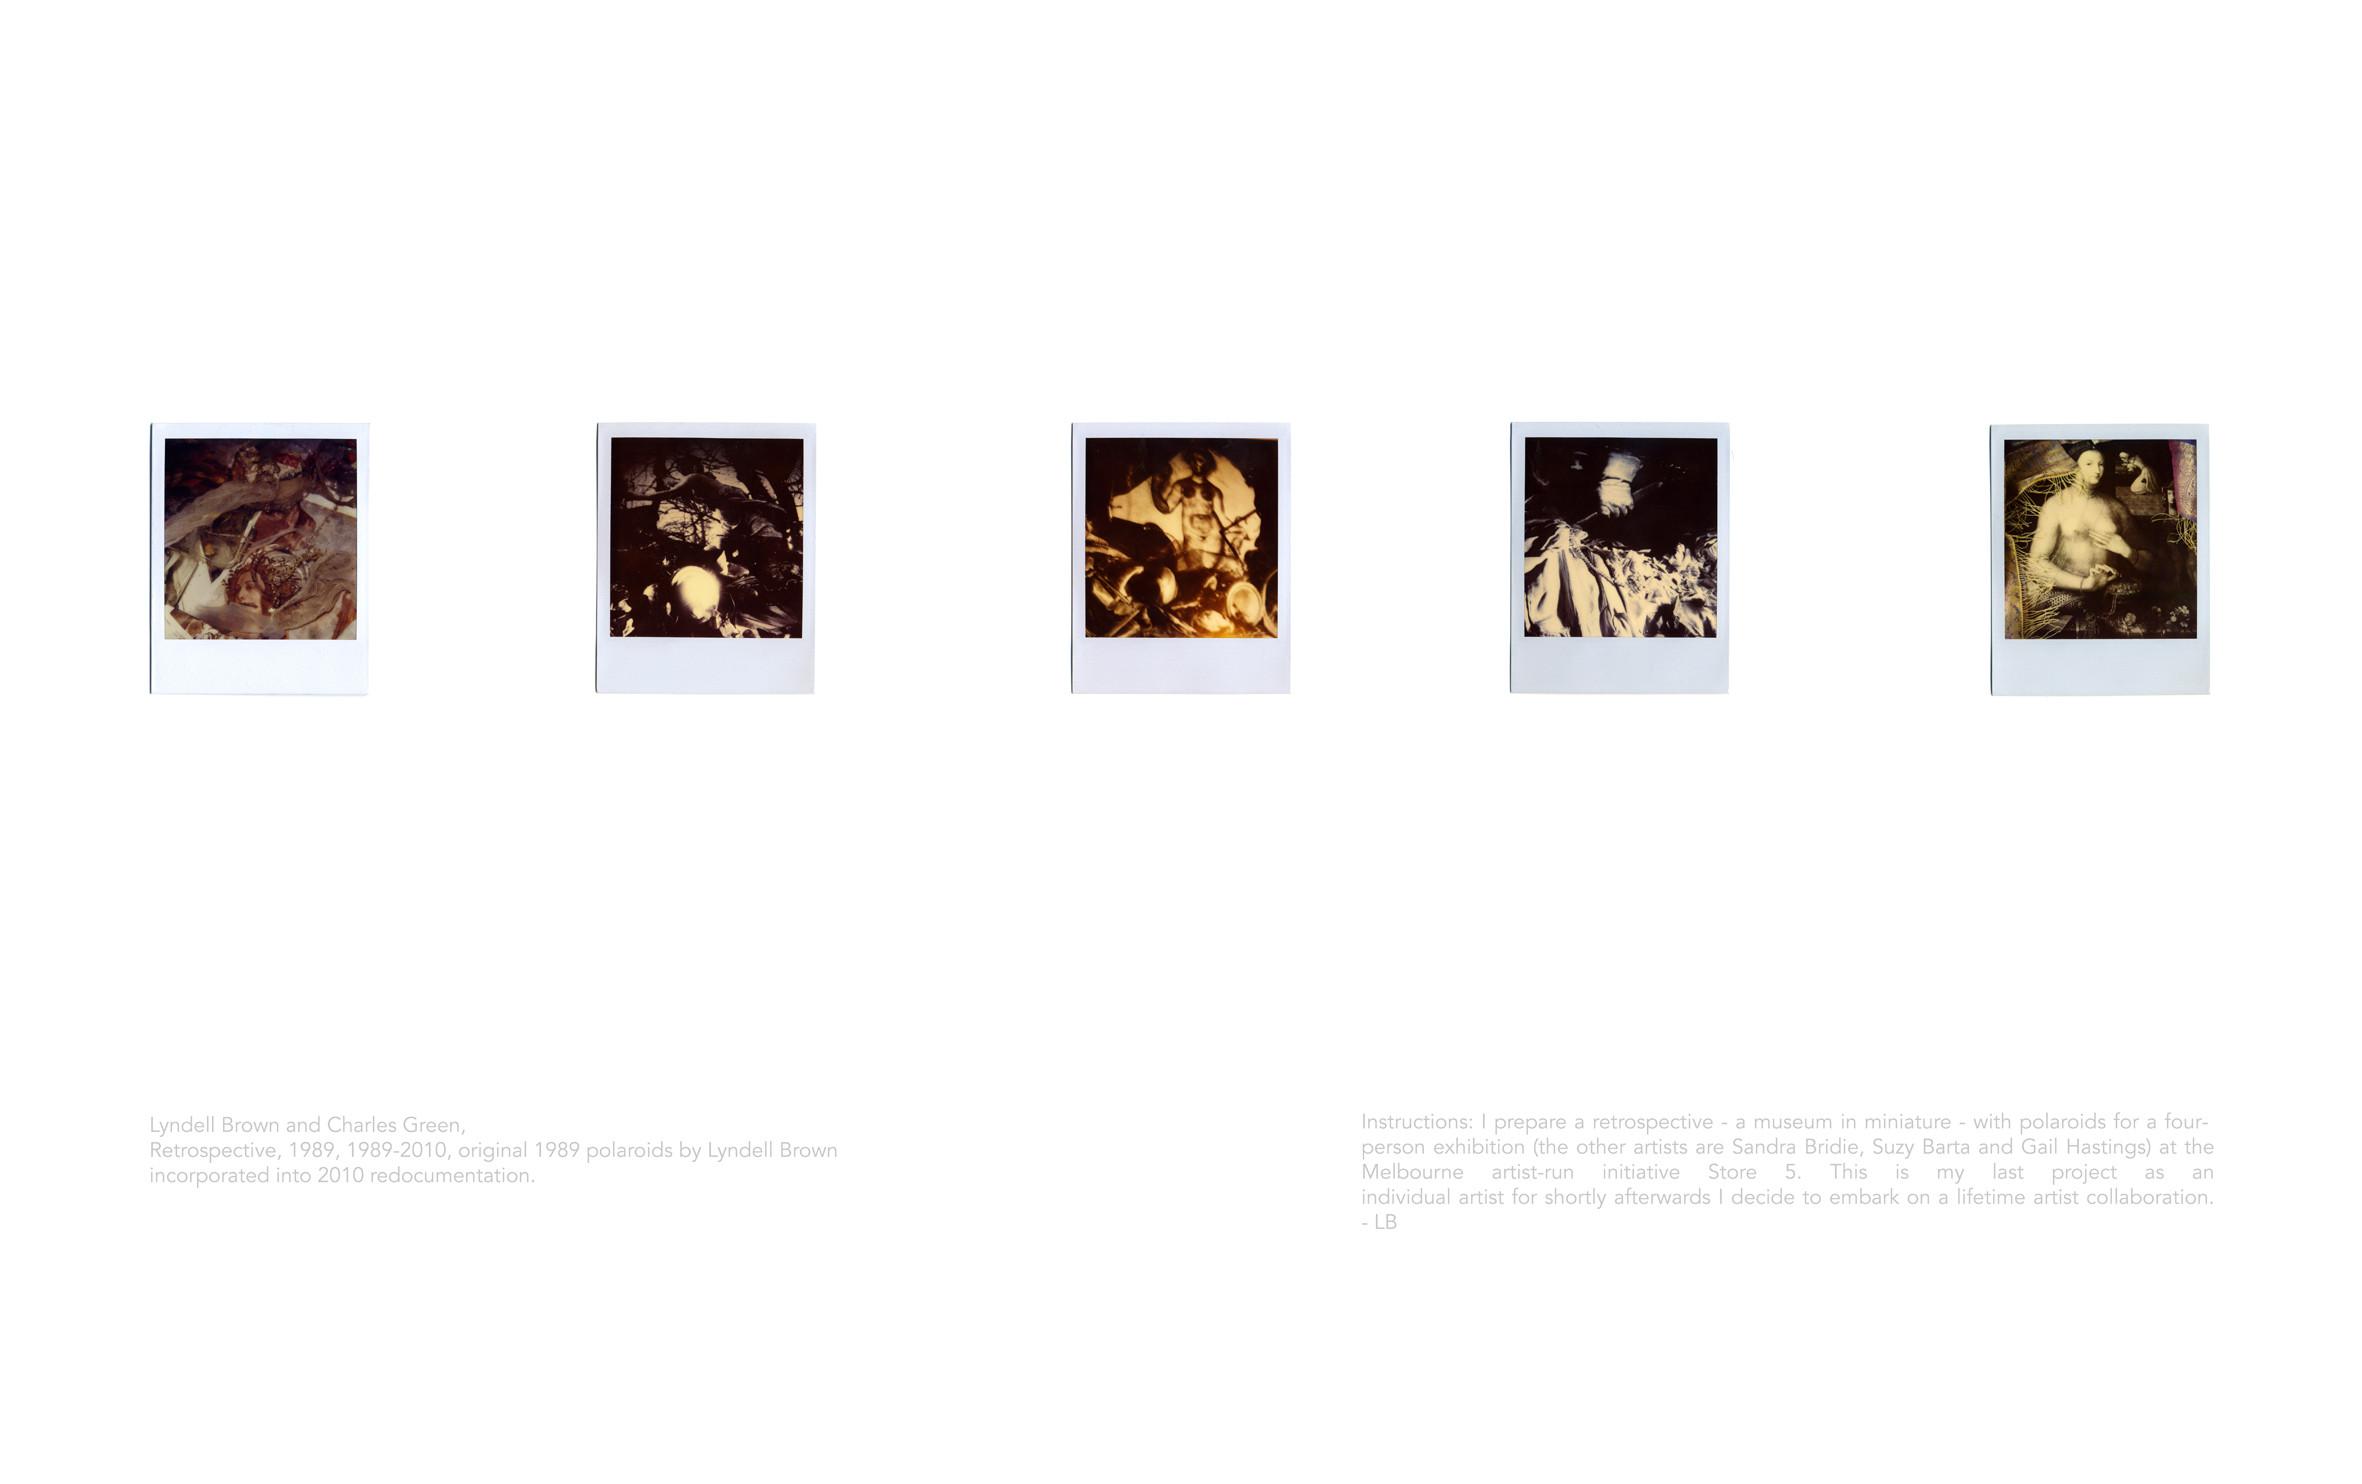 LYNDELL BROWN CHARLES GREEN     Retrospective, 1989. Retrospective Version  1989-2010 Inkjet print on rag paper, original 1989 polaroids by Lyndell Brown incorporated into 2010 redocumentation 90 x 65.5 cm